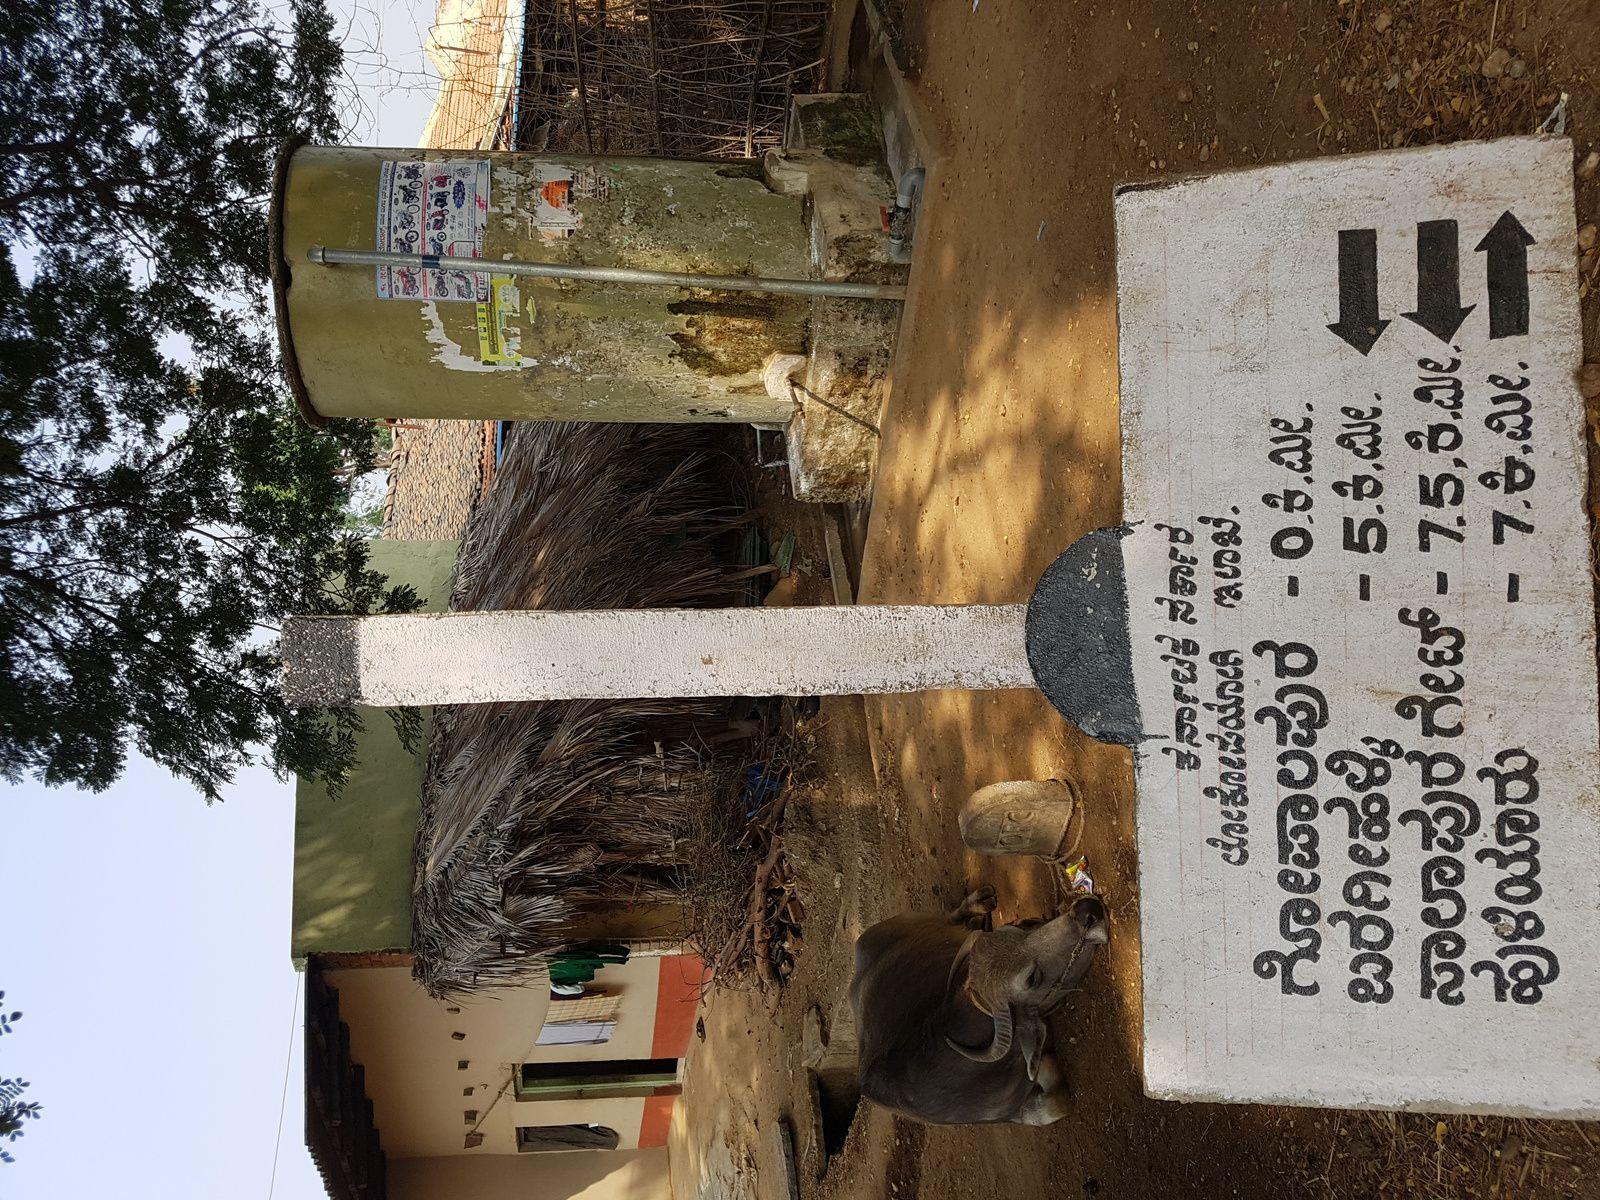 KARNATAKA LA ROUTE DE HASSAN AU FORT DE CHITRADURGA EN DIRECTION DE HOSPET